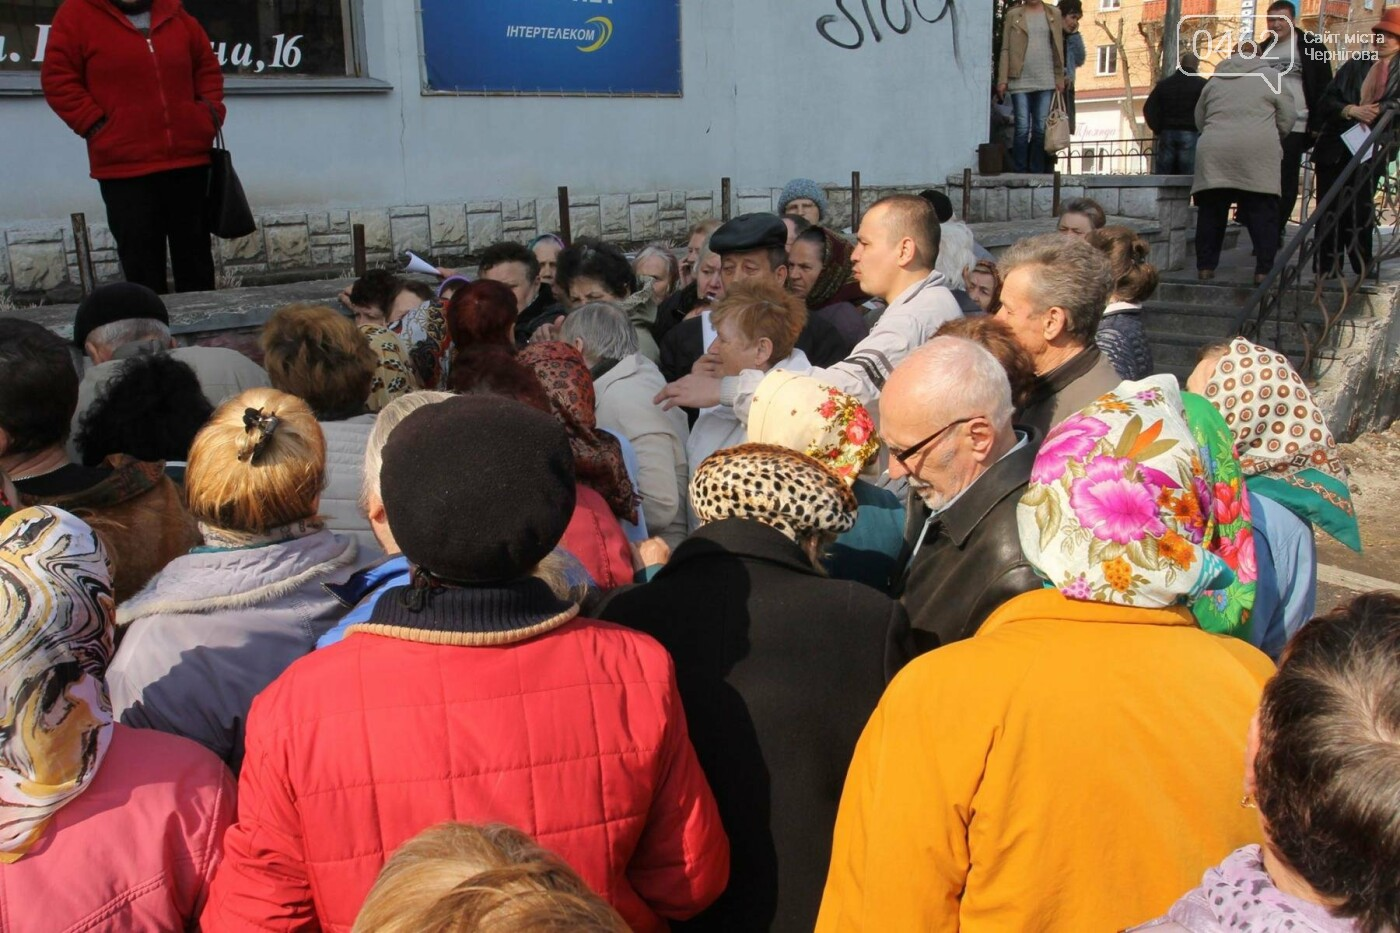 Каждому малоимущему по тысяче гривен: игра на чувствах черниговских пенсионеров, фото-1